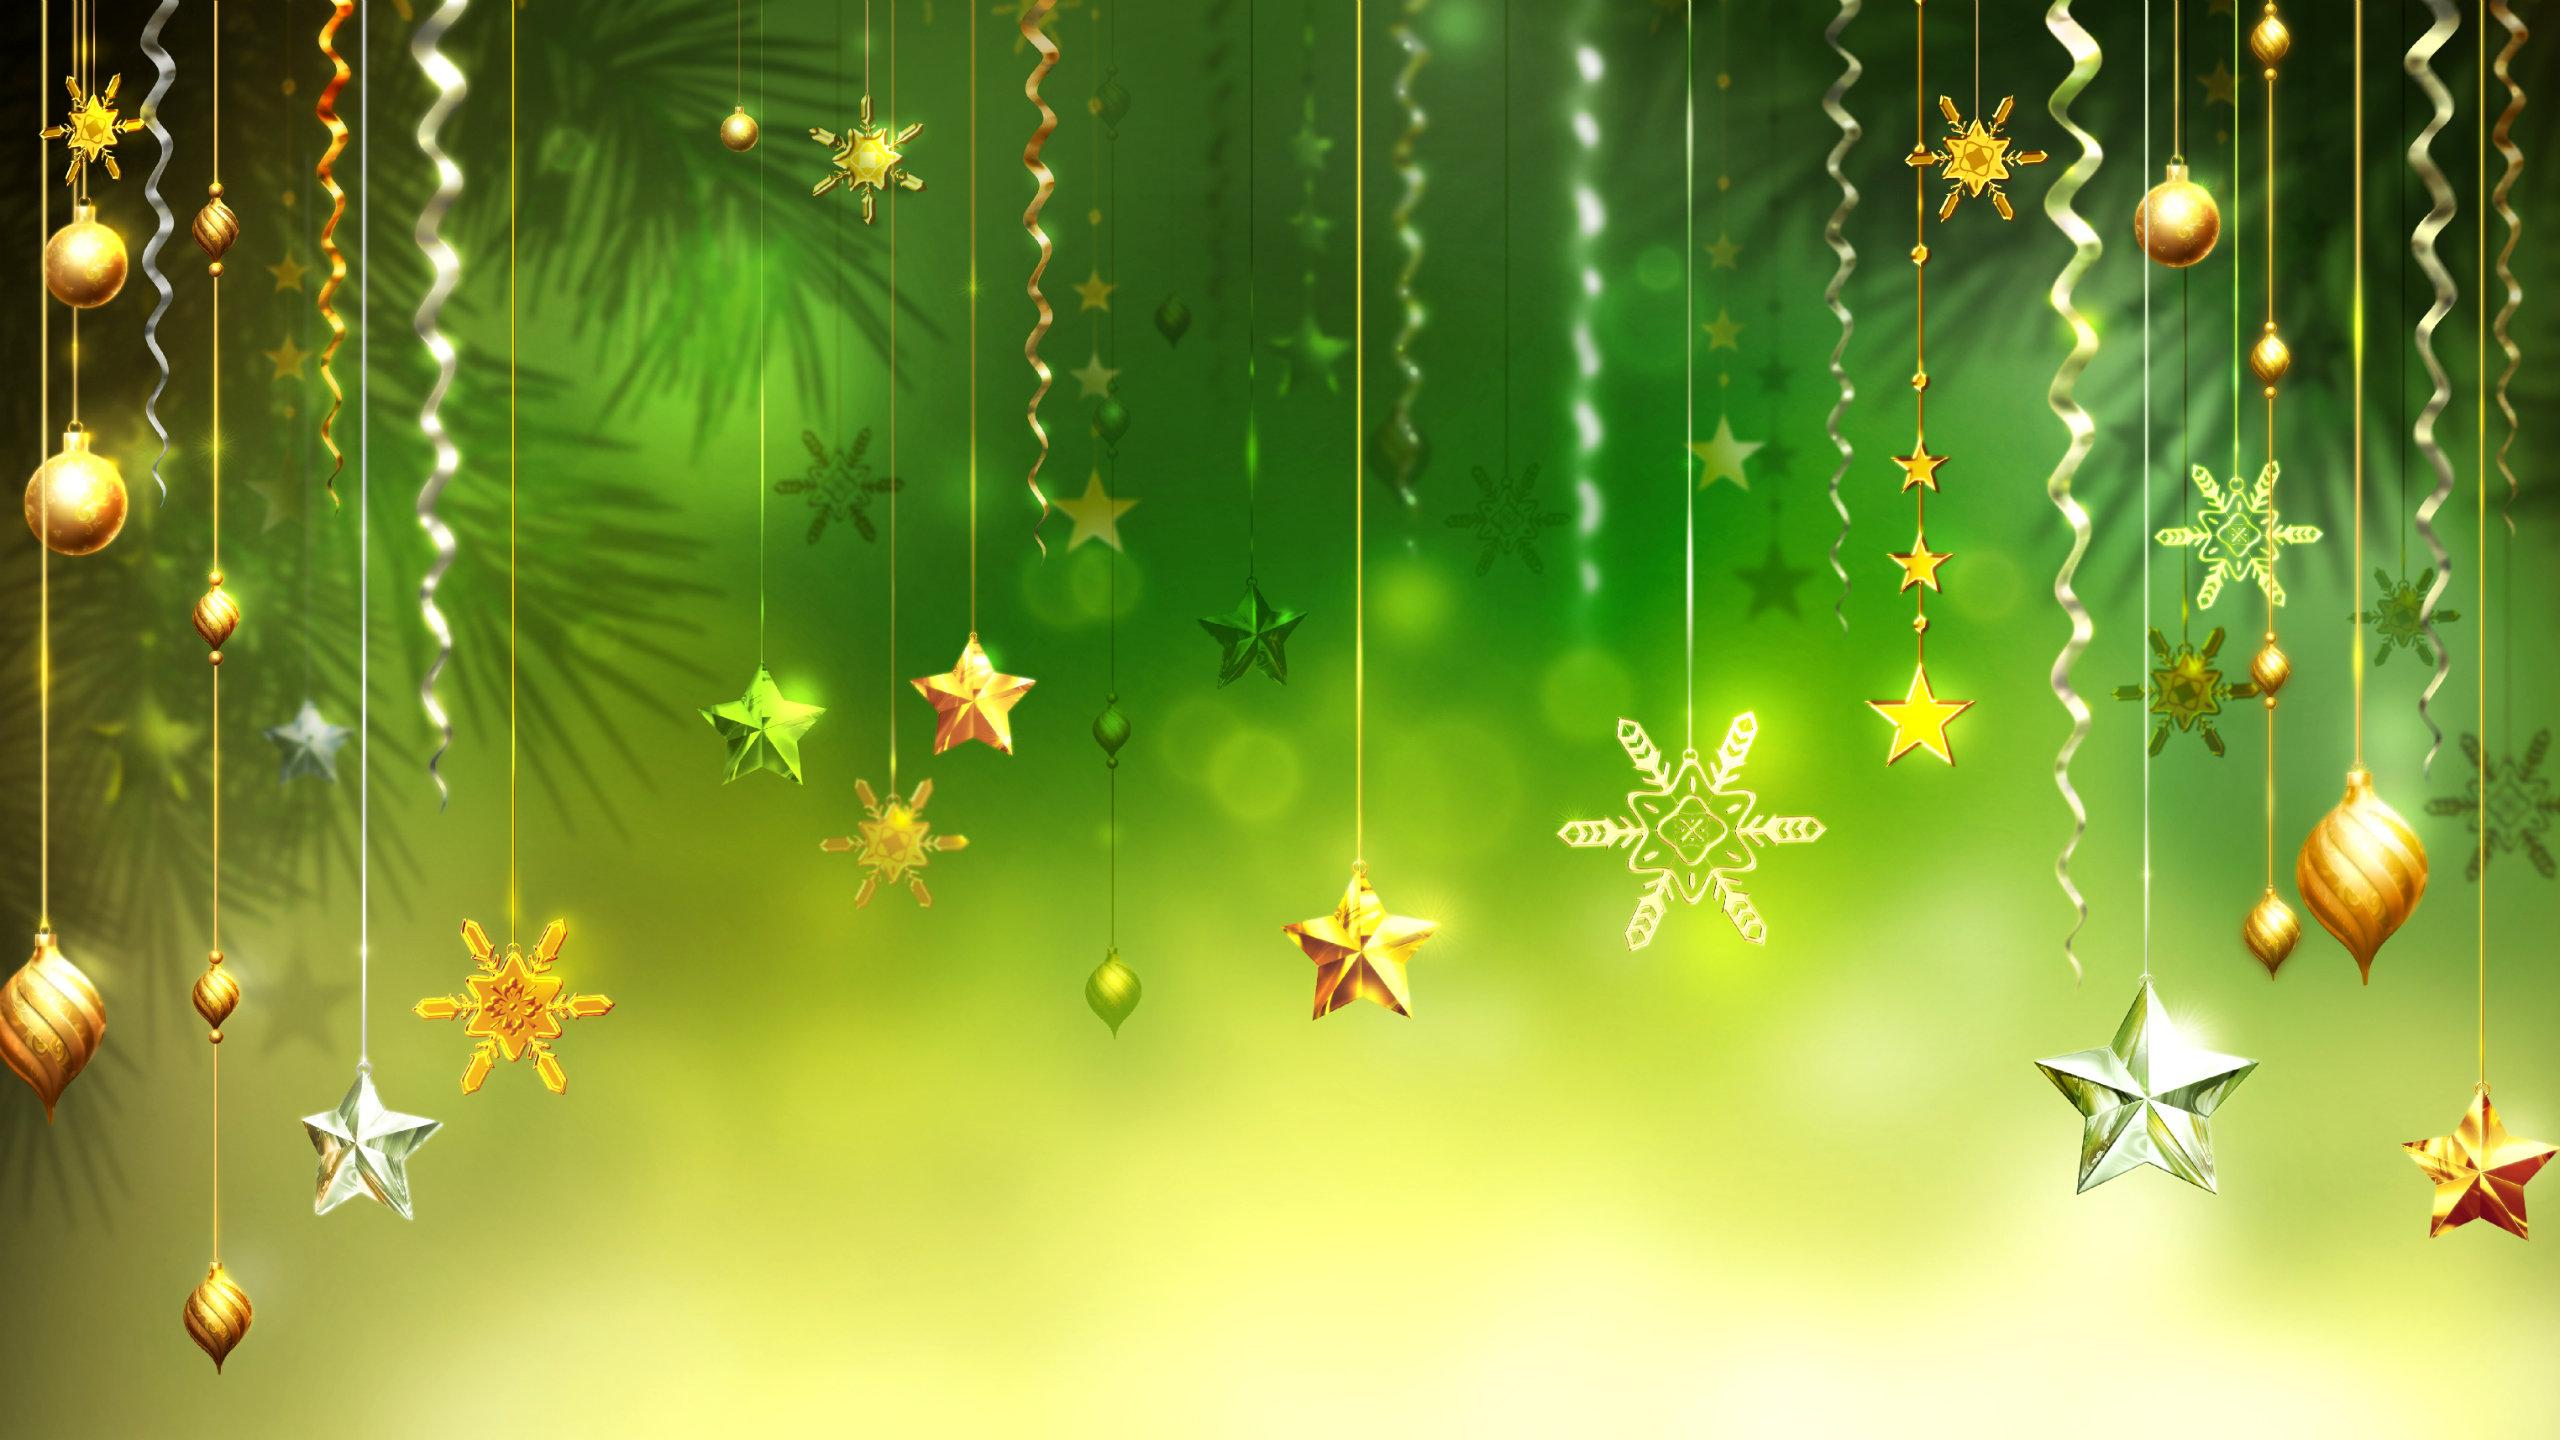 High Resolution Christmas Ornaments Decorations Hd 2560x1440 Wallpaper Id434426 For Desktop